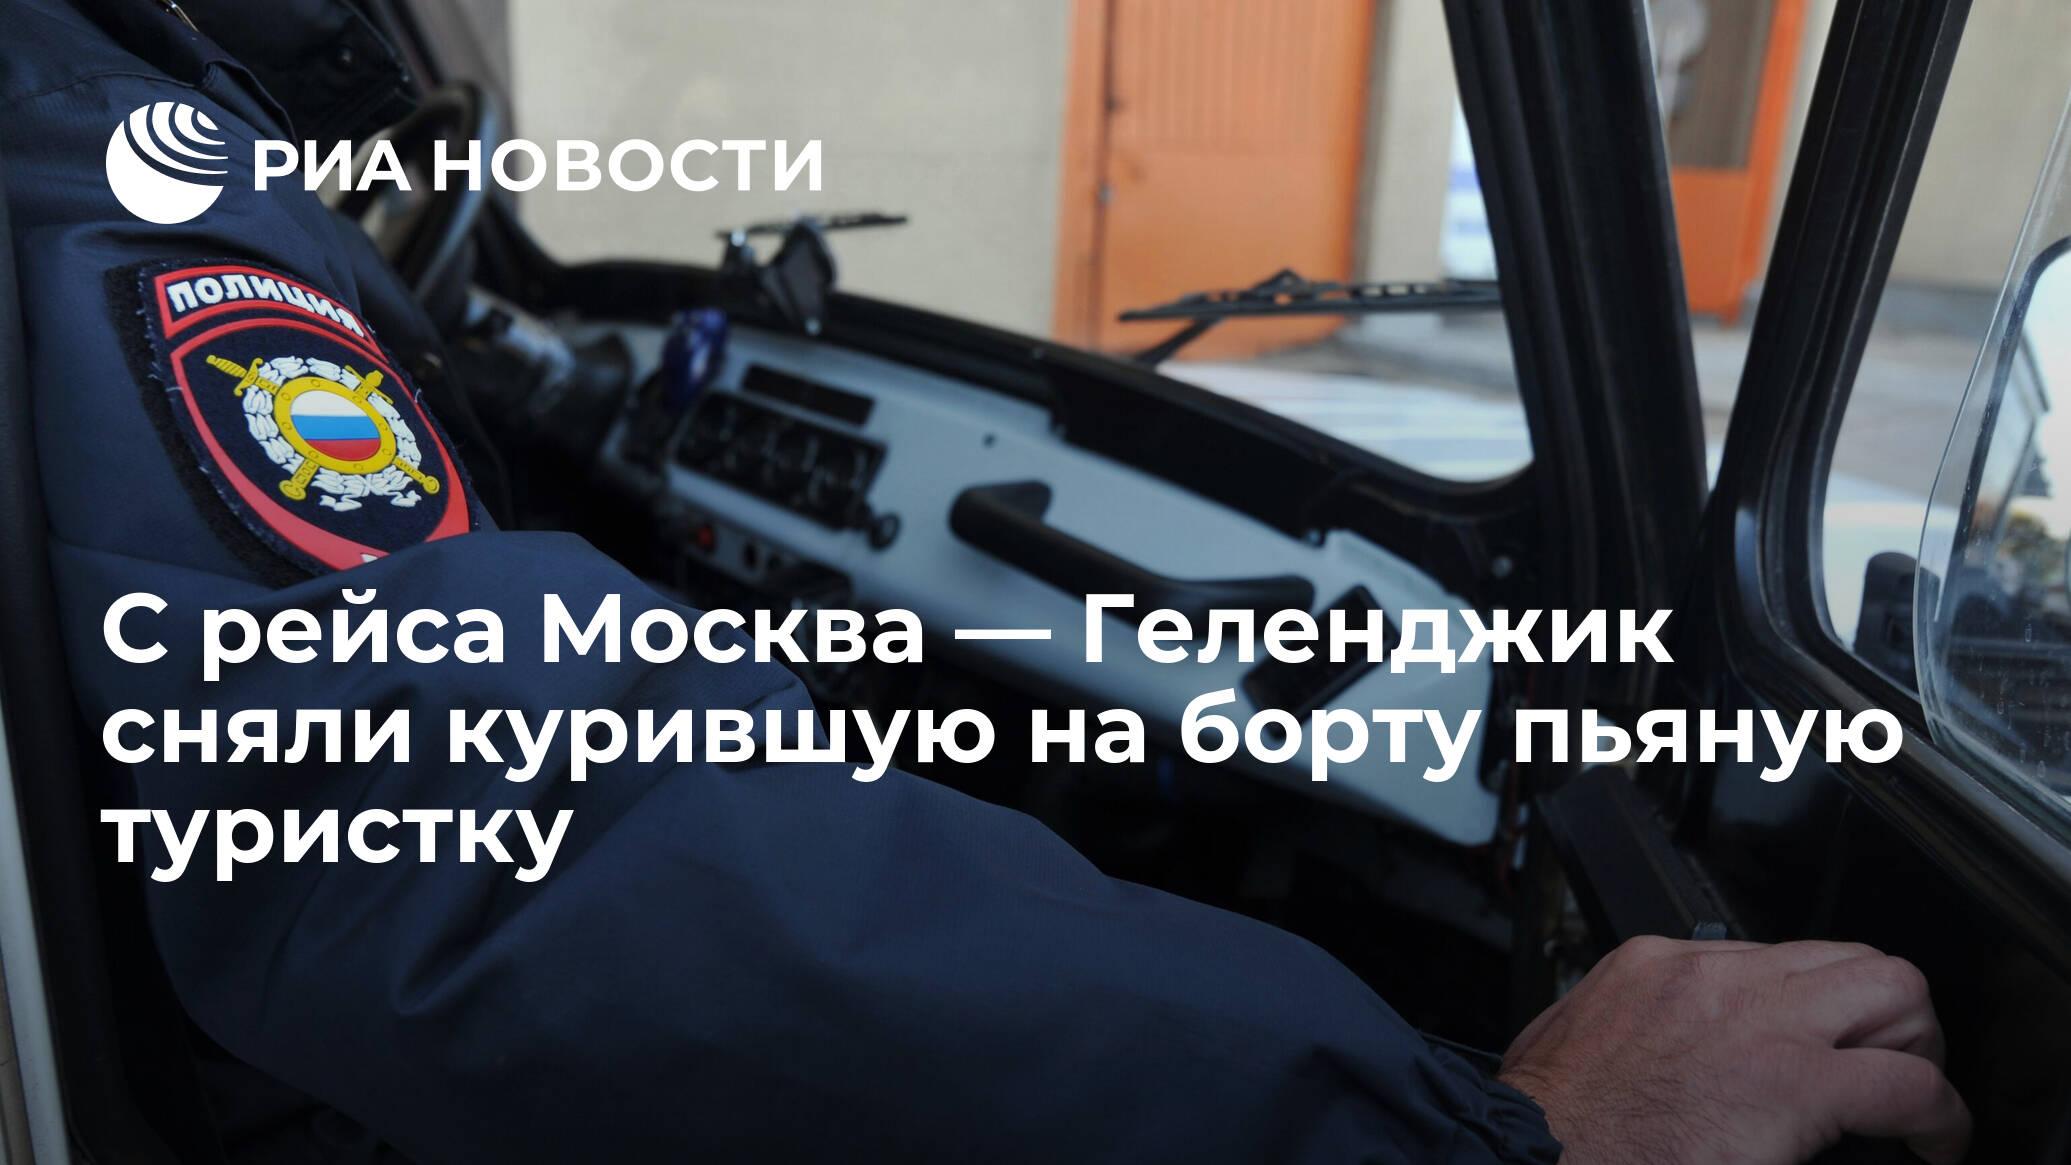 С рейса Москва — Геленджик сняли курившую на борту пьяную туристку